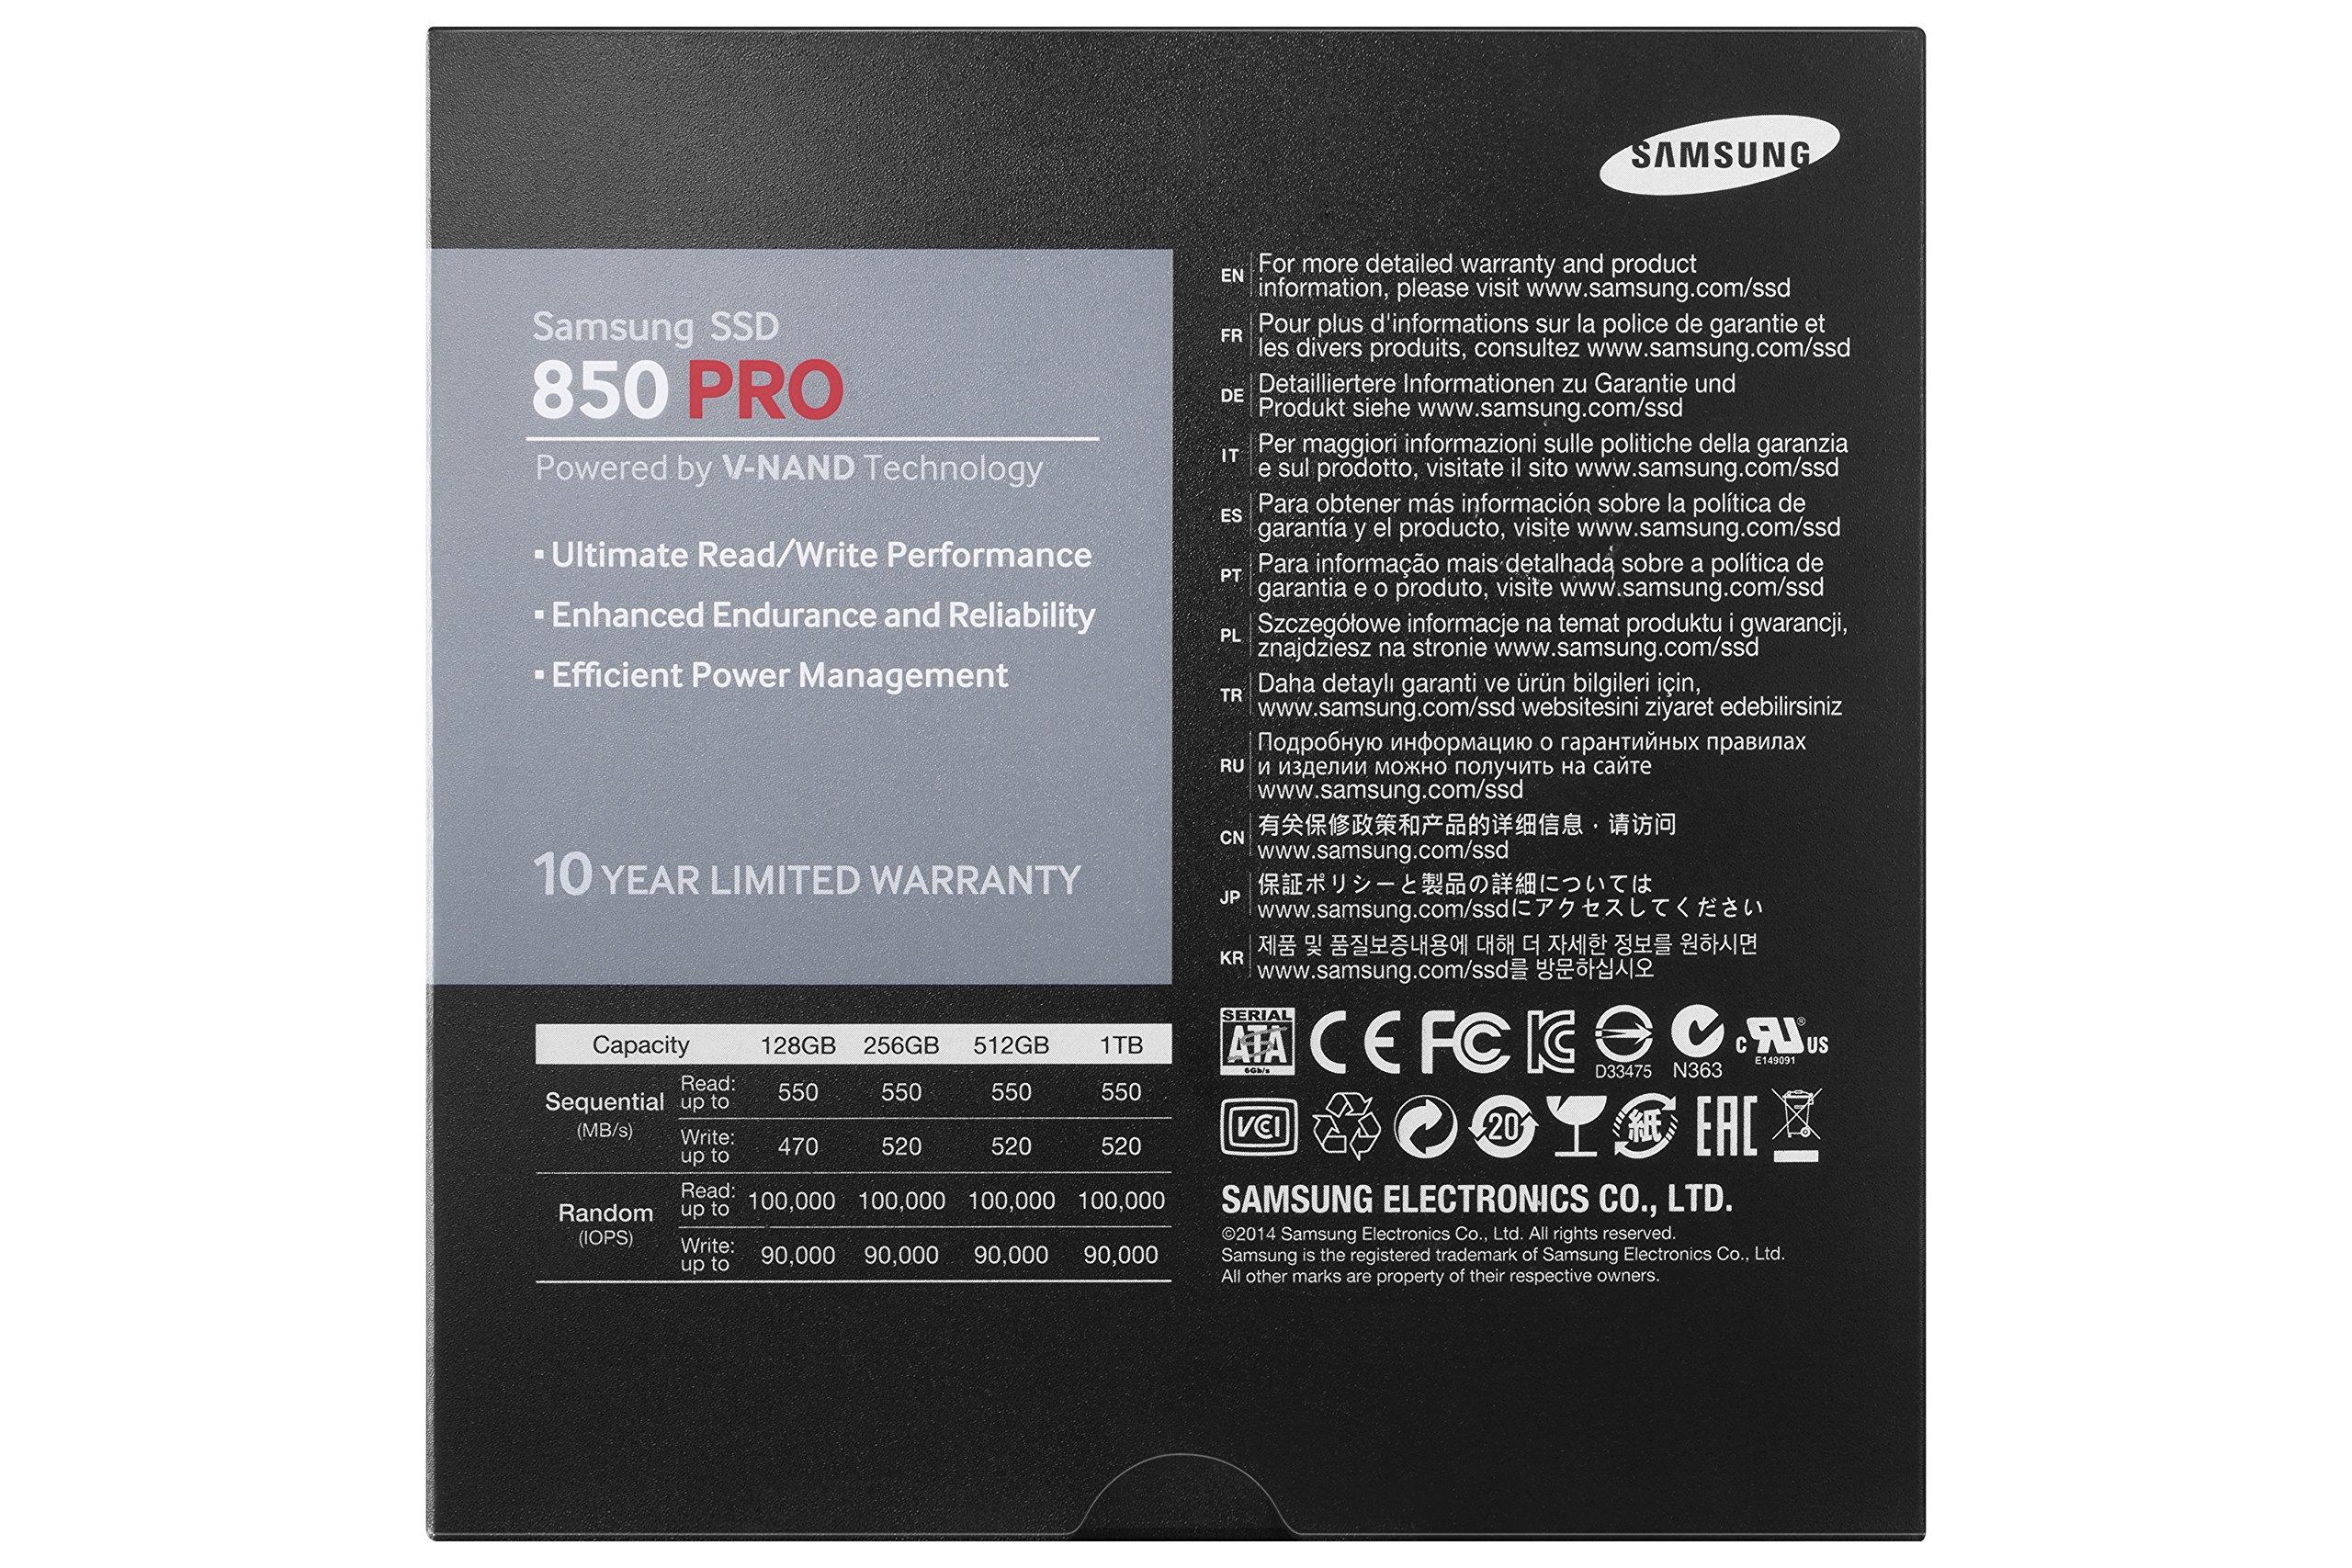 Samsung 850 PRO - 512GB - 2.5-Inch SATA III Internal SSD (MZ-7KE512BW) by Samsung